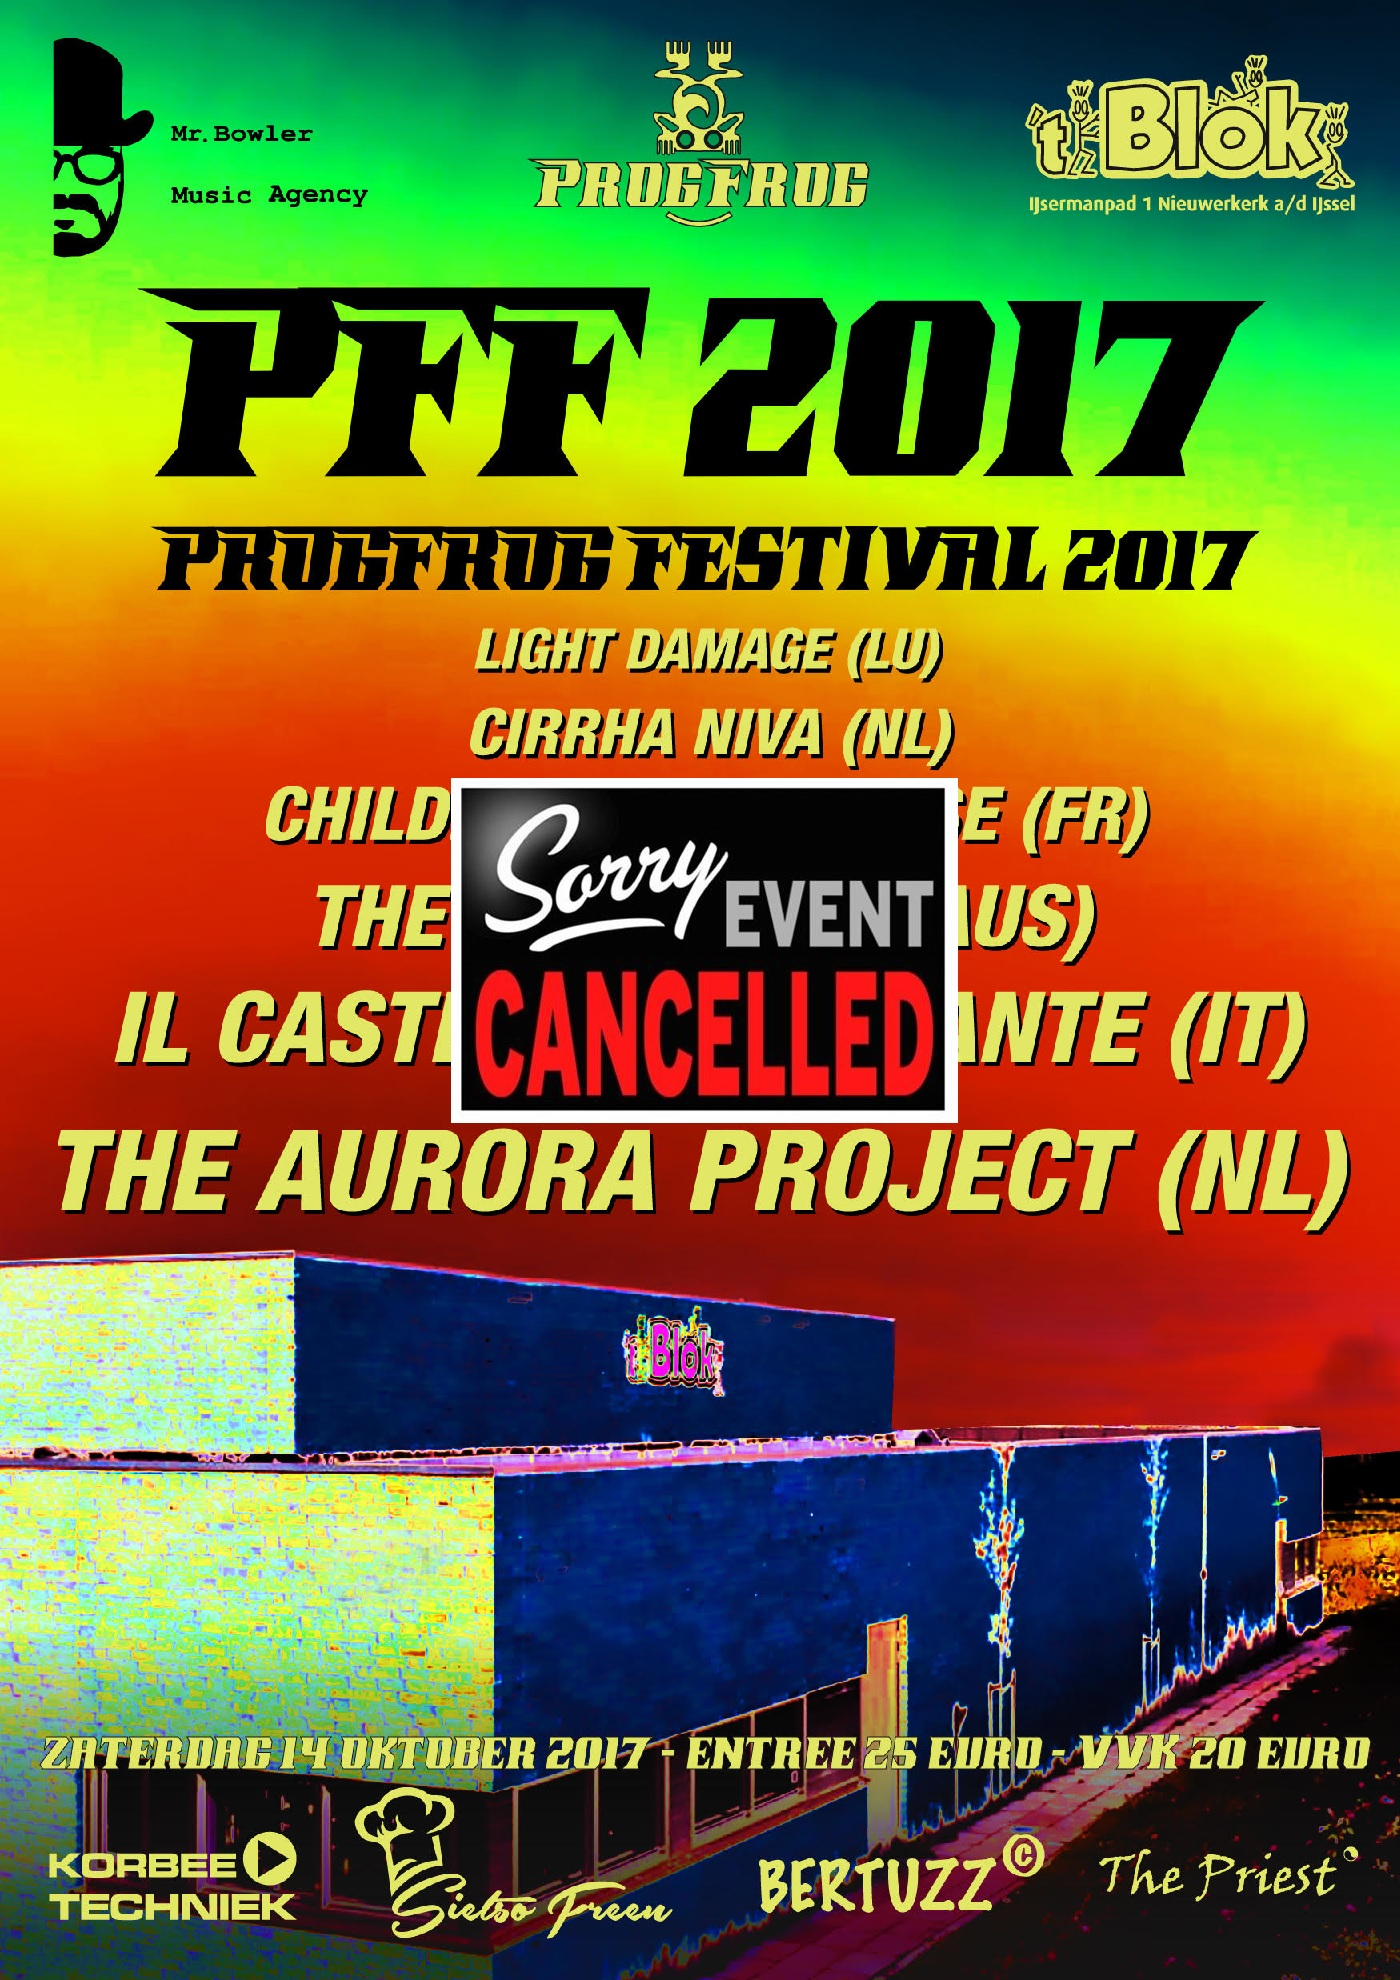 ProgFrogFestival 2017 GEANNULEERD